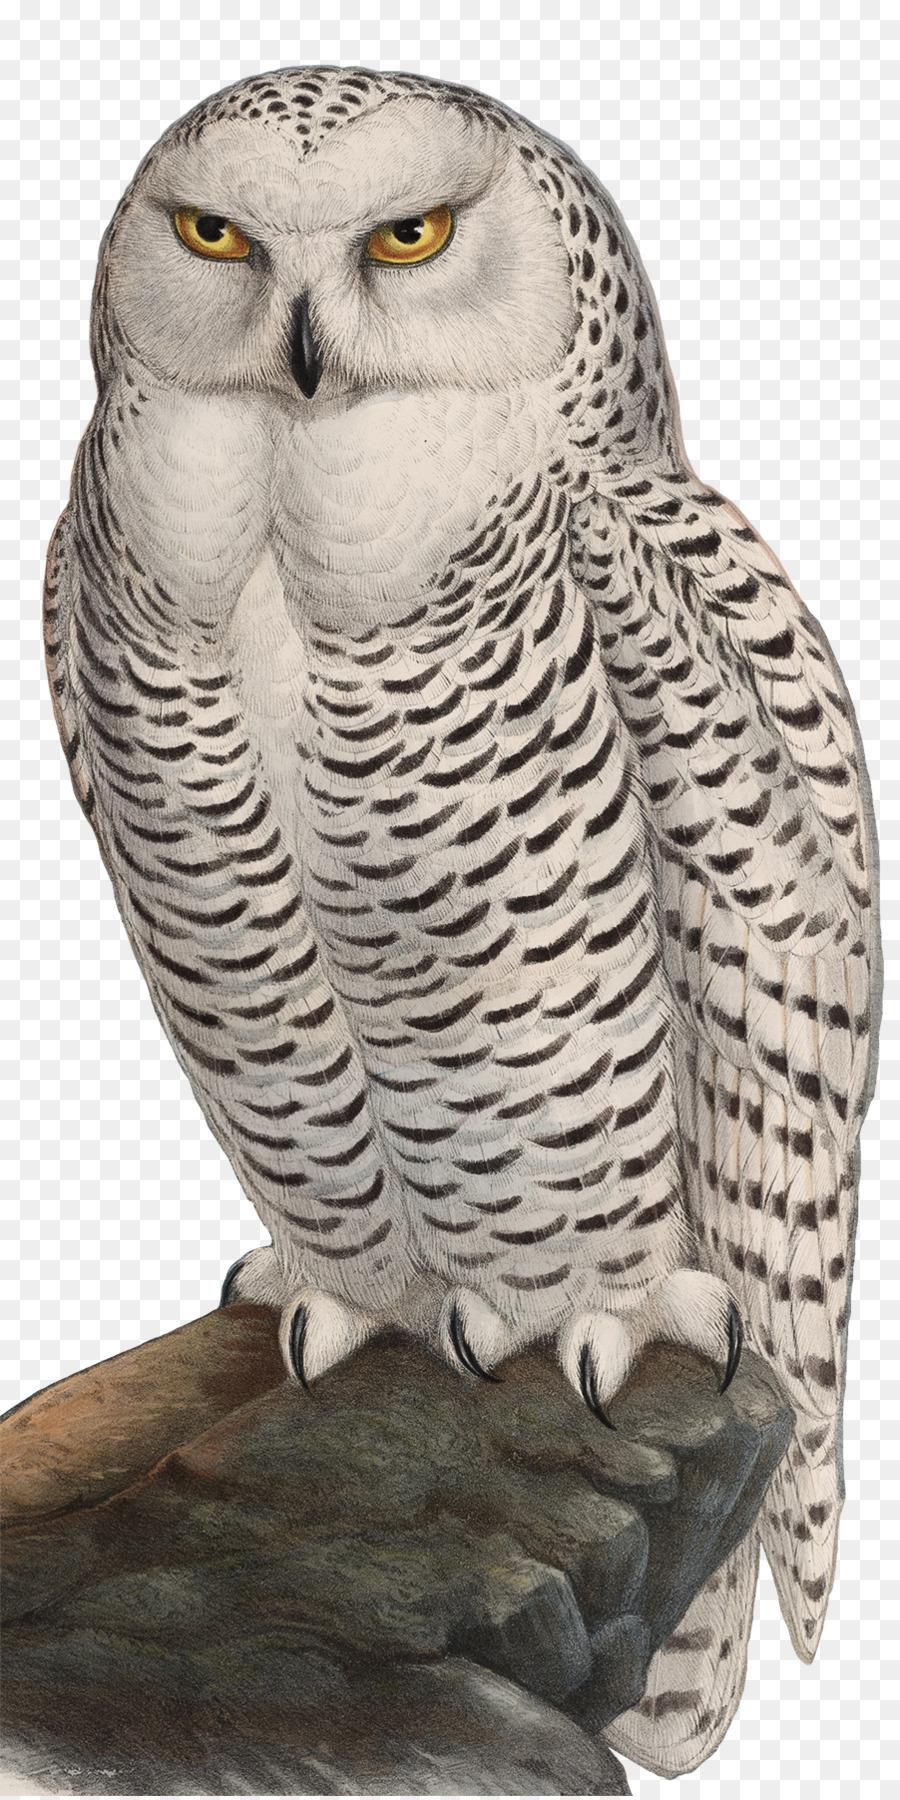 900x1800 Great Grey Owl Bird Snowy Owl Watercolor Painting